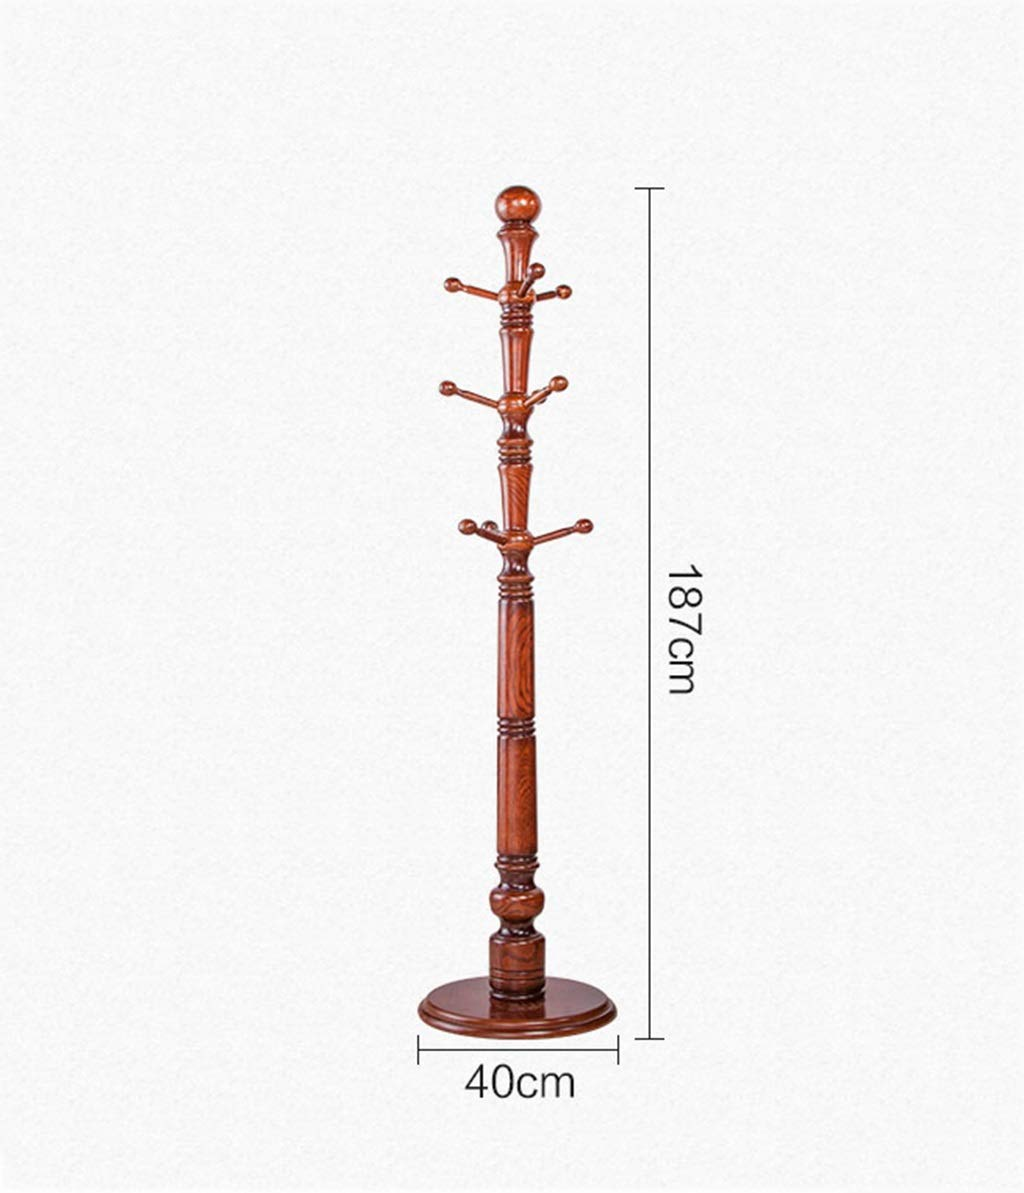 Appendiabiti ingresso Appendiabiti a forma di albero Appendiabiti a forma  di cappello Appendiabiti a forma di ombrello Portaoggetti Appendiabiti per  ...